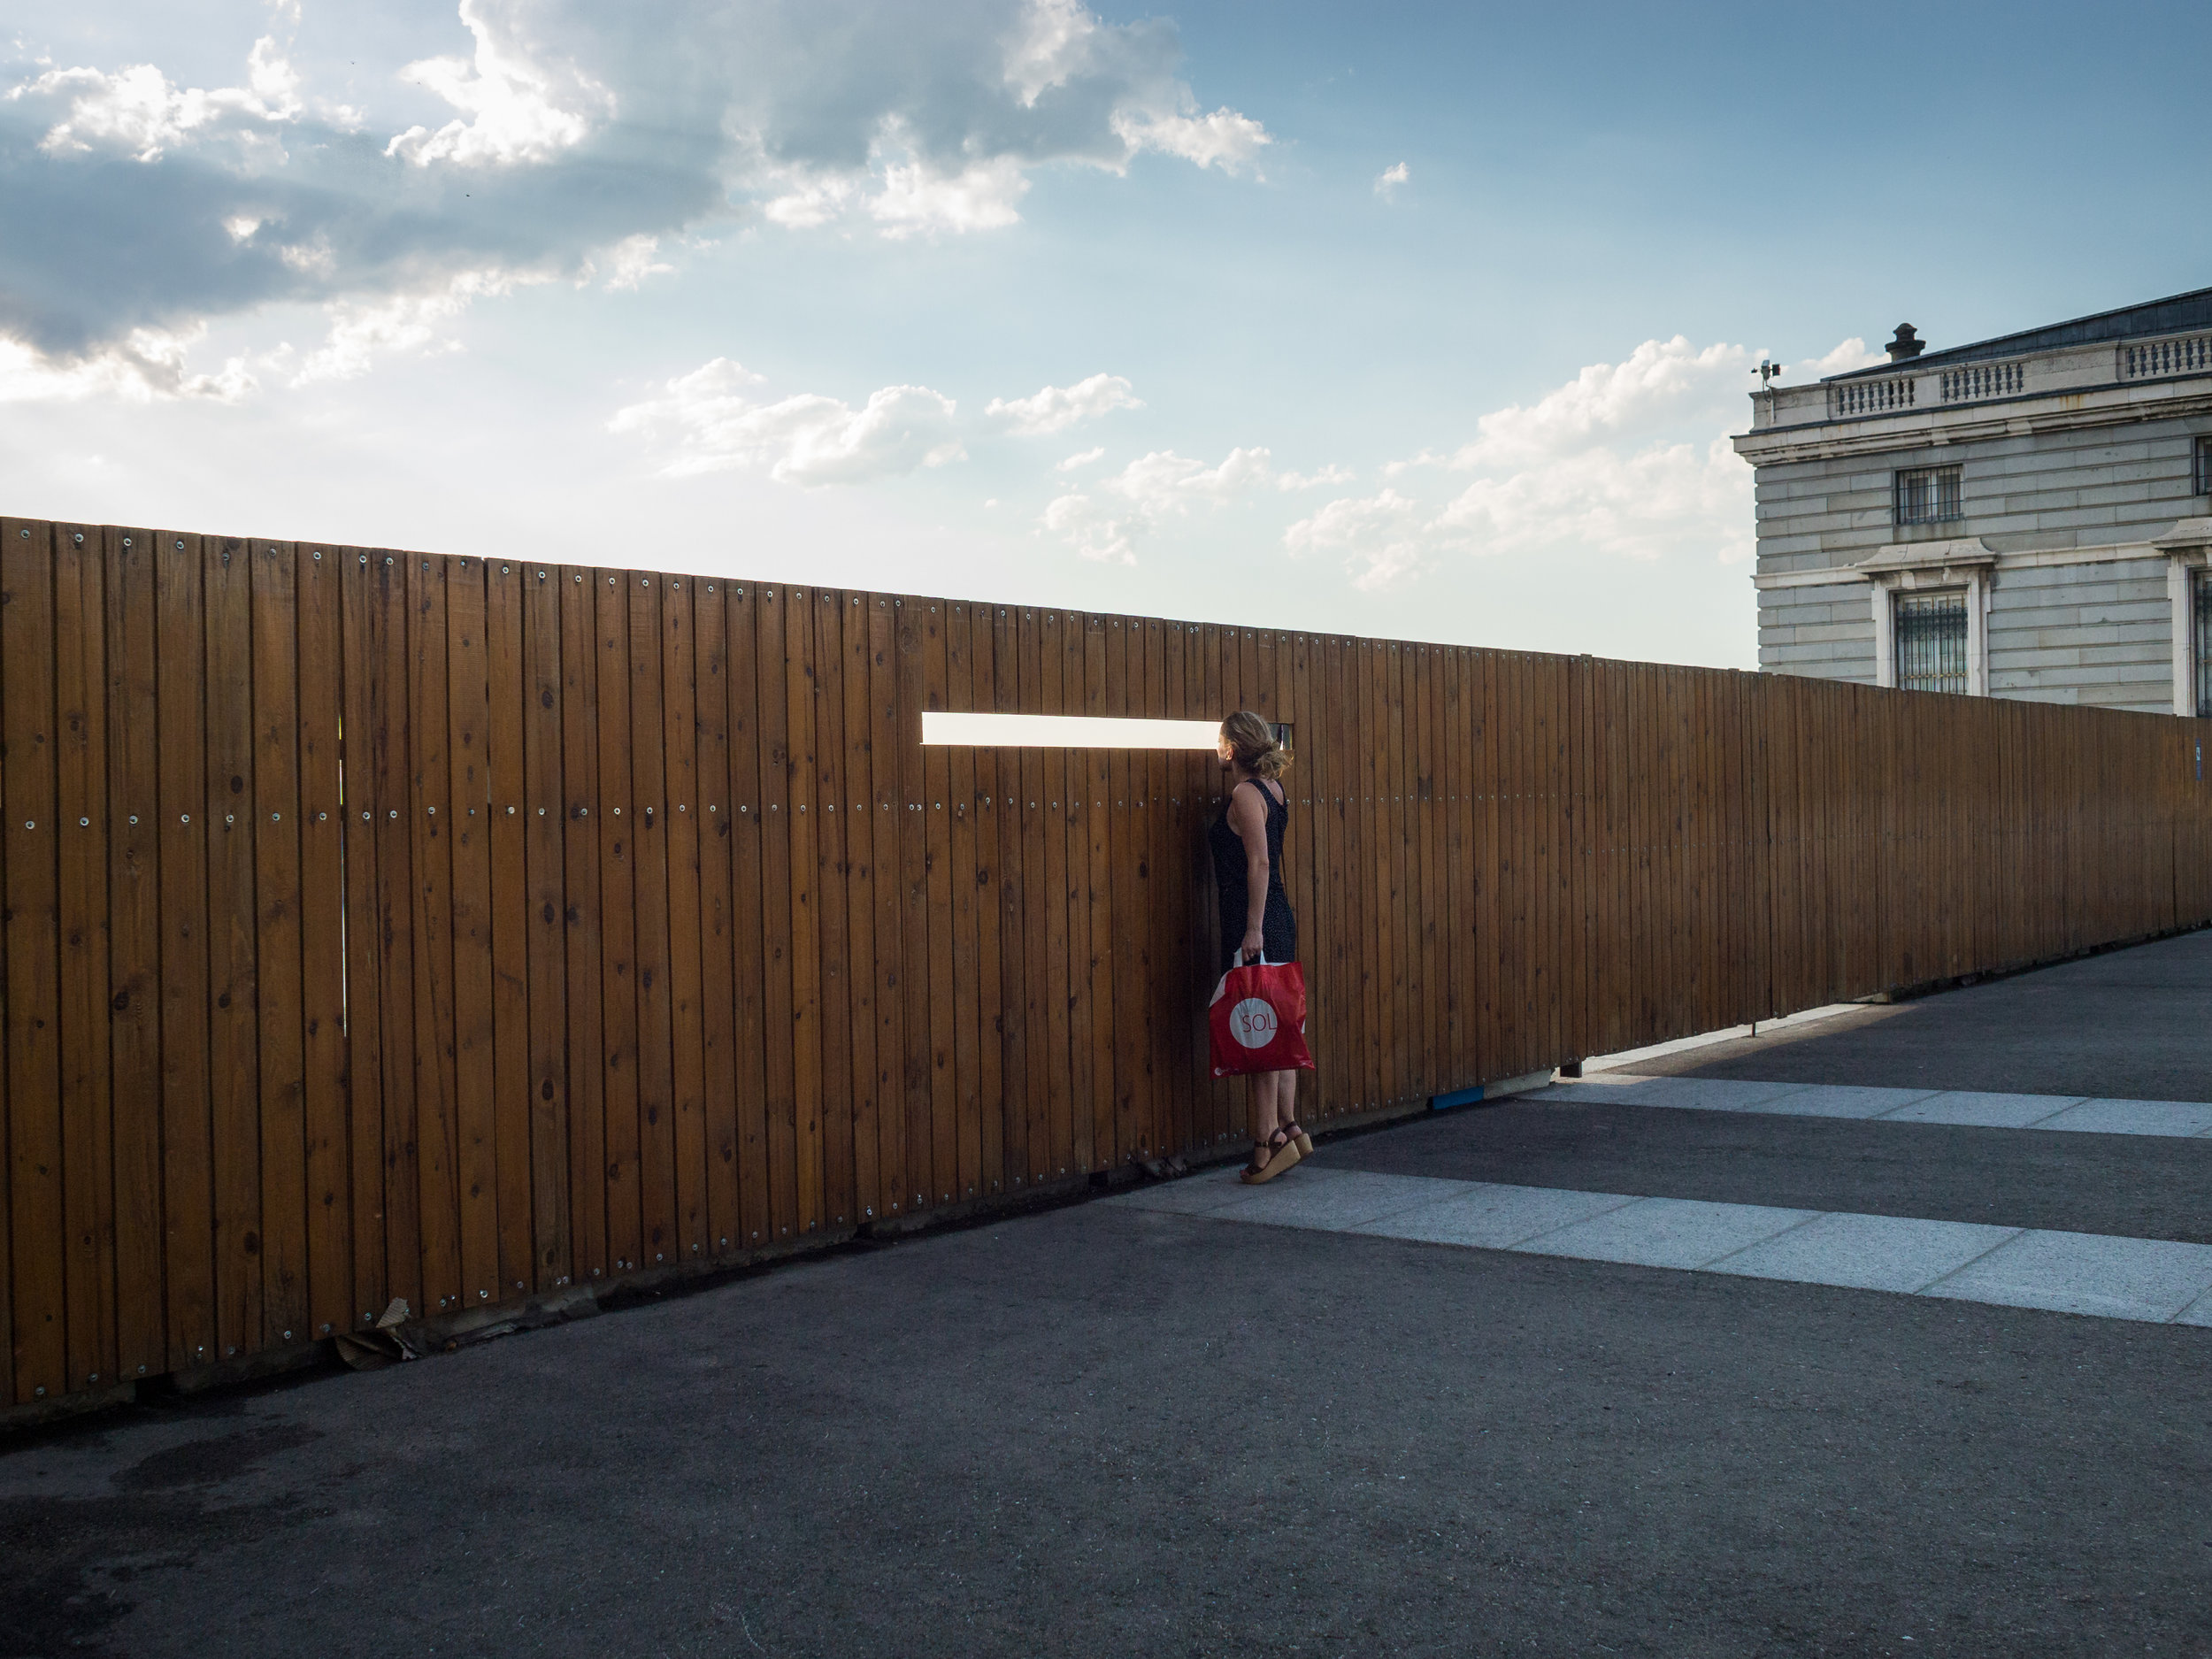 Curiosity in Madrid, Spain